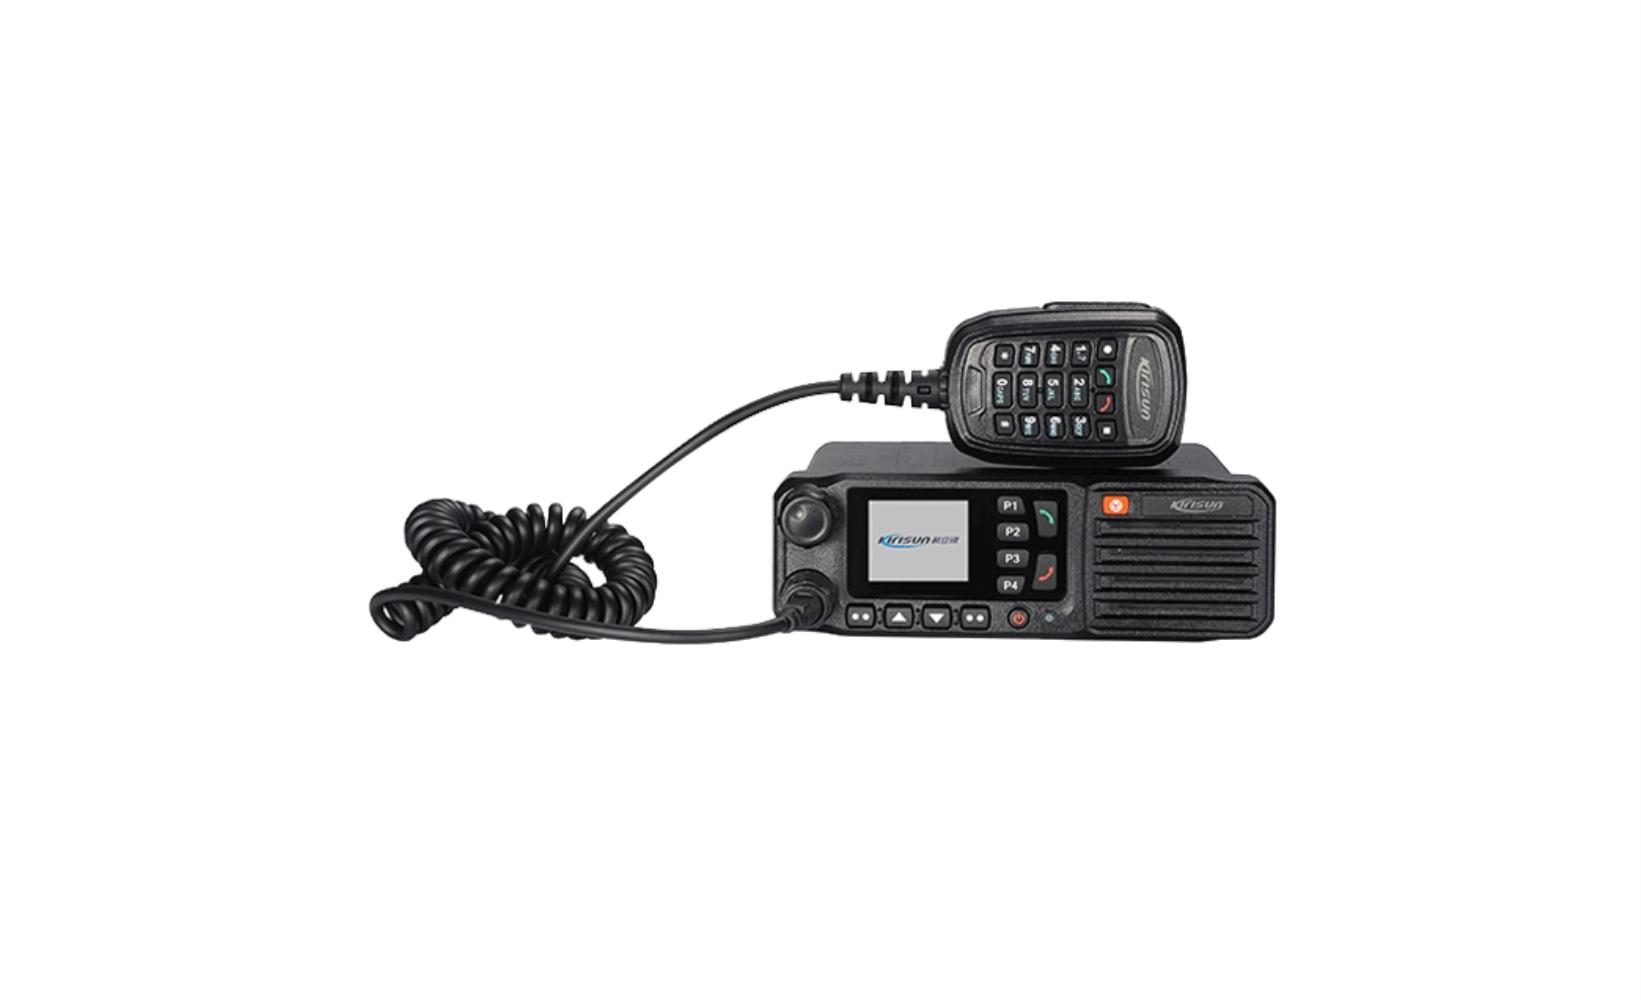 photo of TM-840-VHF-45 - 1024 Channel, 40 Watt, VHF DMR Mobile Radio